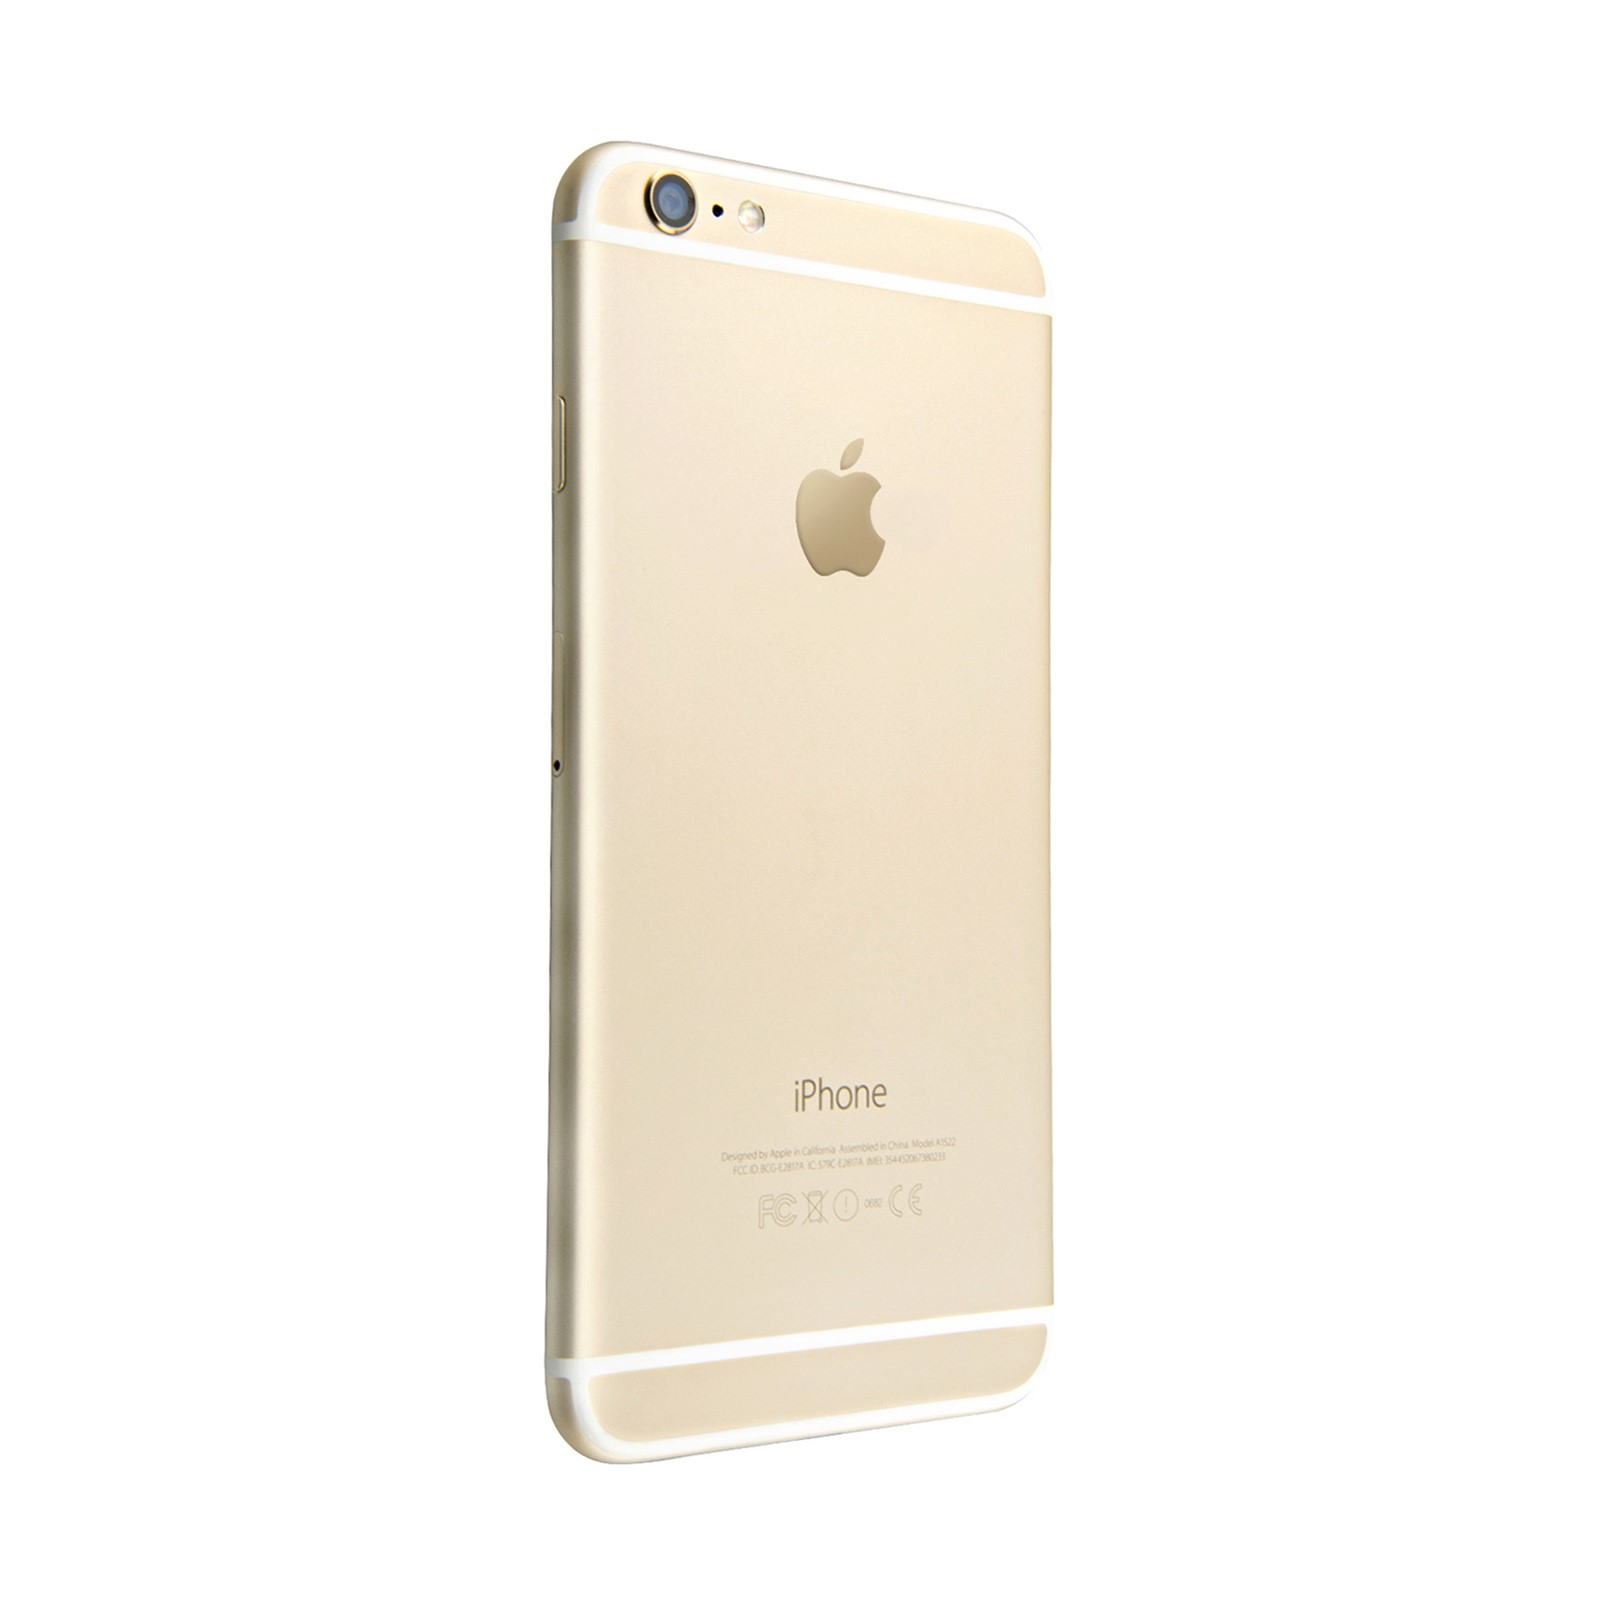 apple iphone 6 verizon factory unlocked 4g lte 8mp camera smartphone ebay. Black Bedroom Furniture Sets. Home Design Ideas